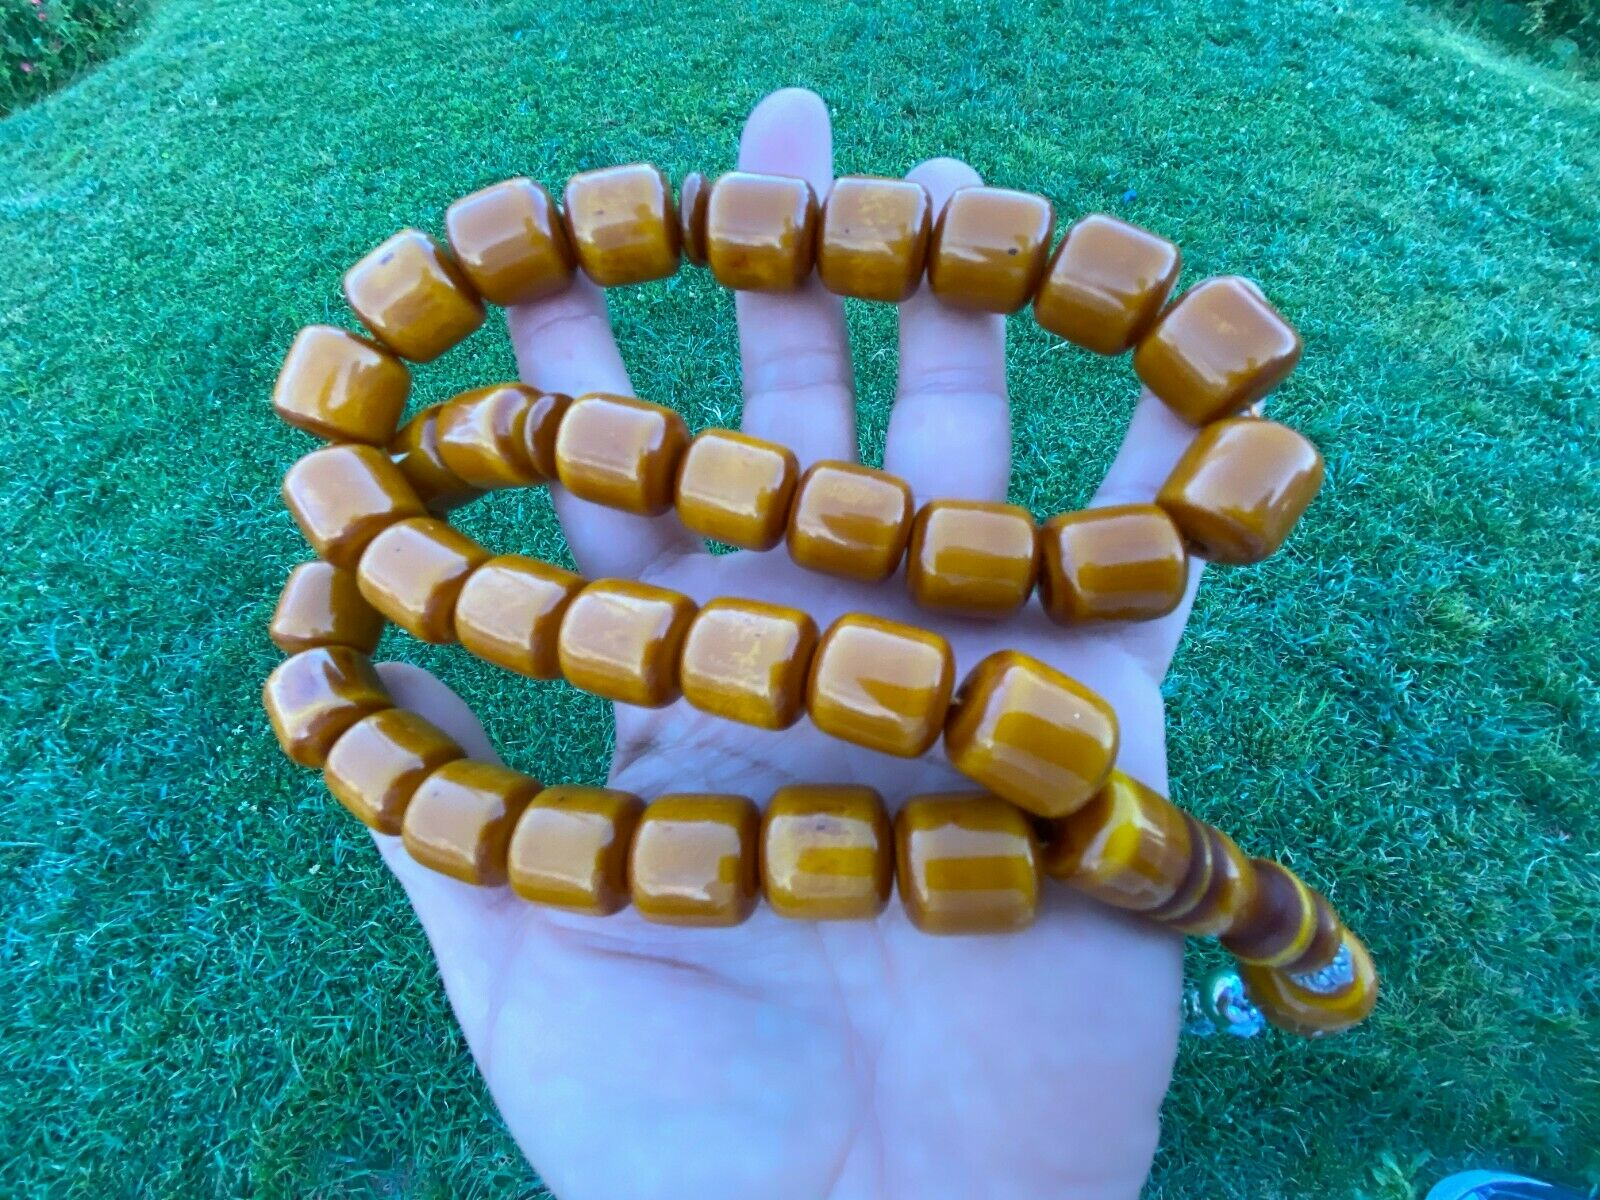 Ottoman Faturan German Amber Sandalous Misbaha Prayer Beads Islamic Gift Tasbih Tasbeeh Tasbeh Rosary Tasbih # 38A